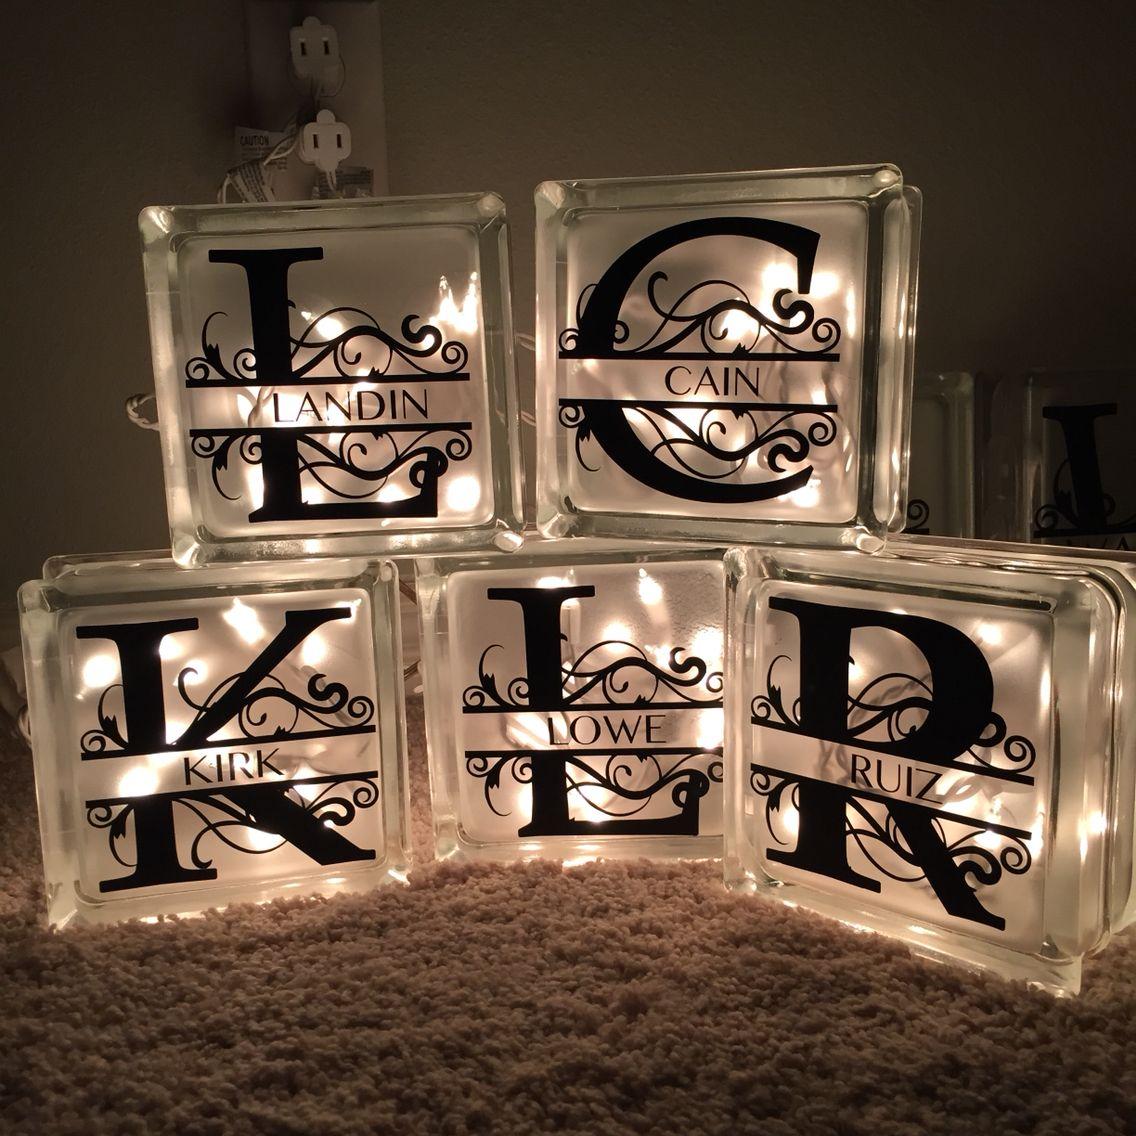 Diy Glass Block Monogram Lights For The Admins At My Husband S